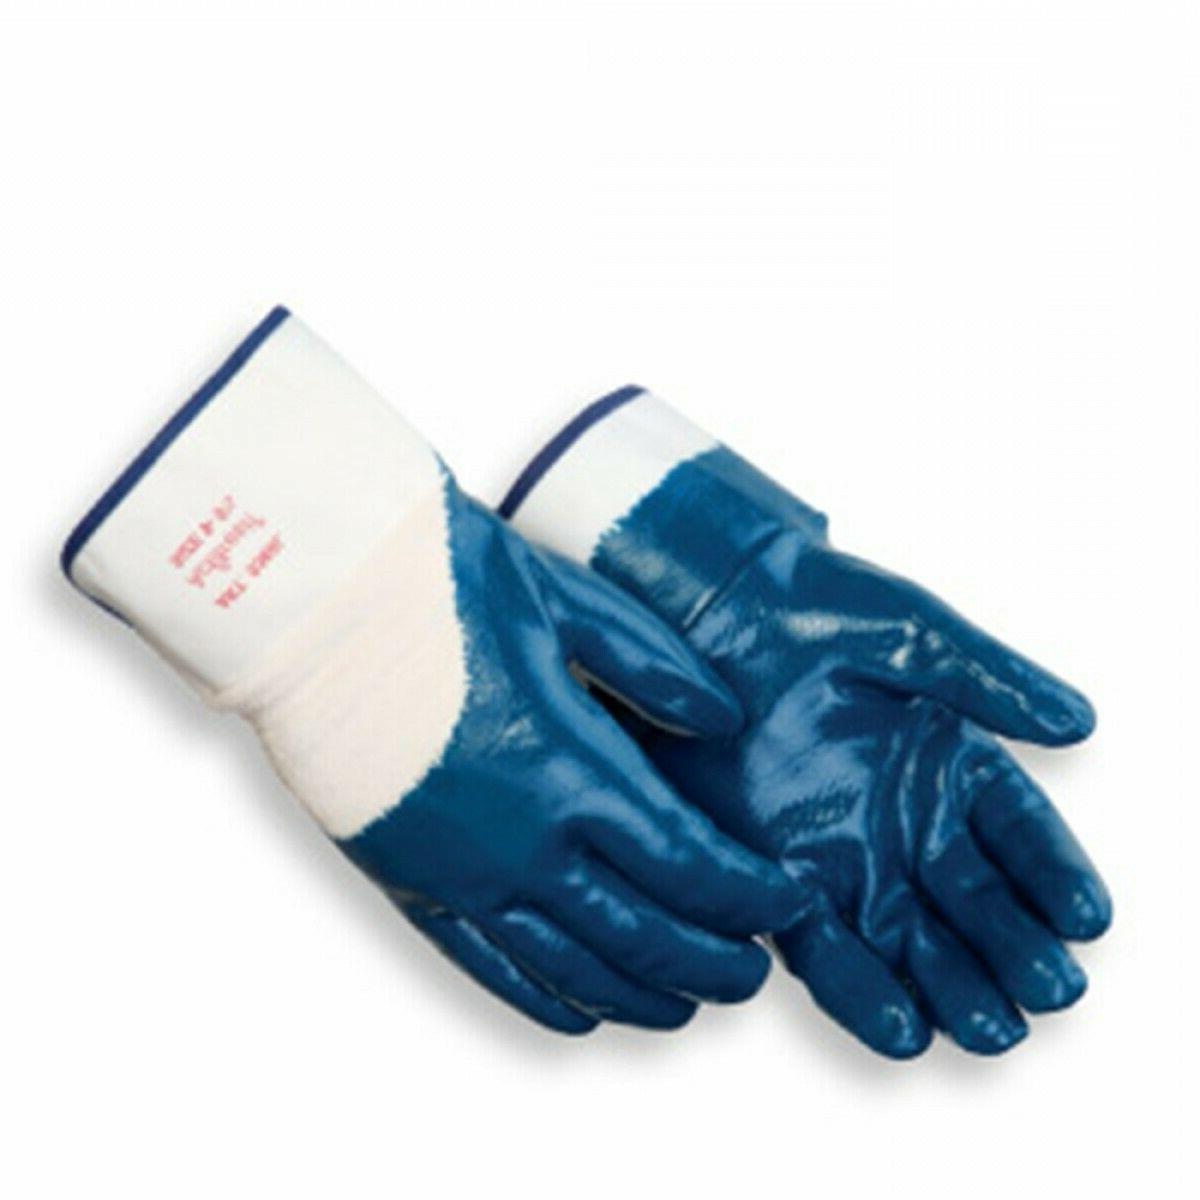 9460sp large nitrile gloves fully coated safety